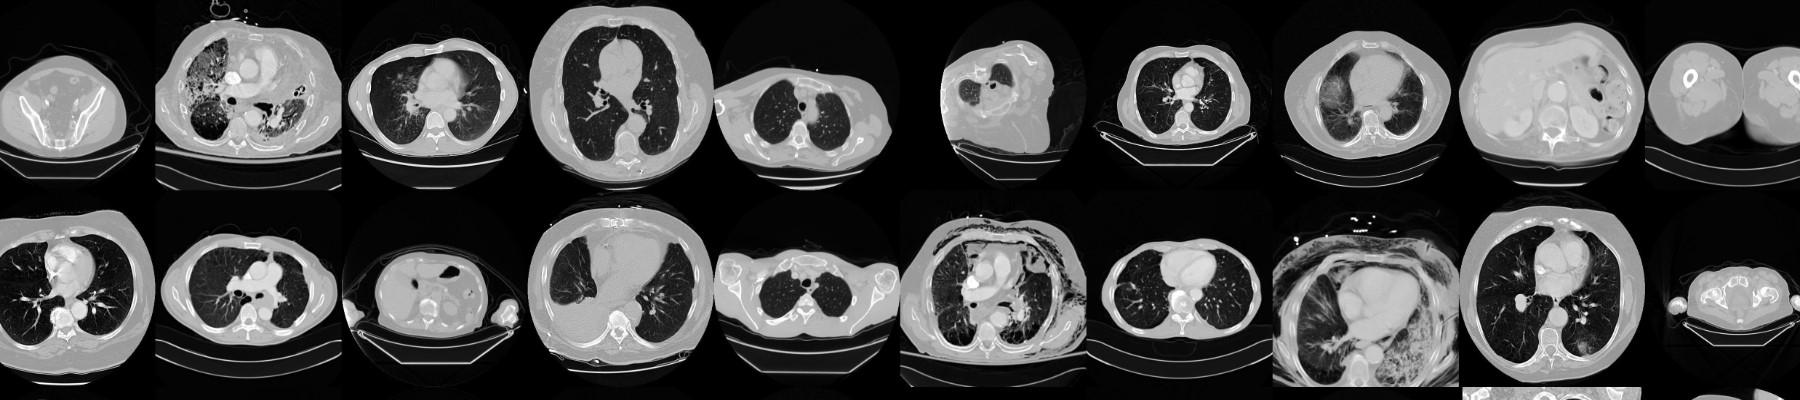 CT Medical Images | Kaggle